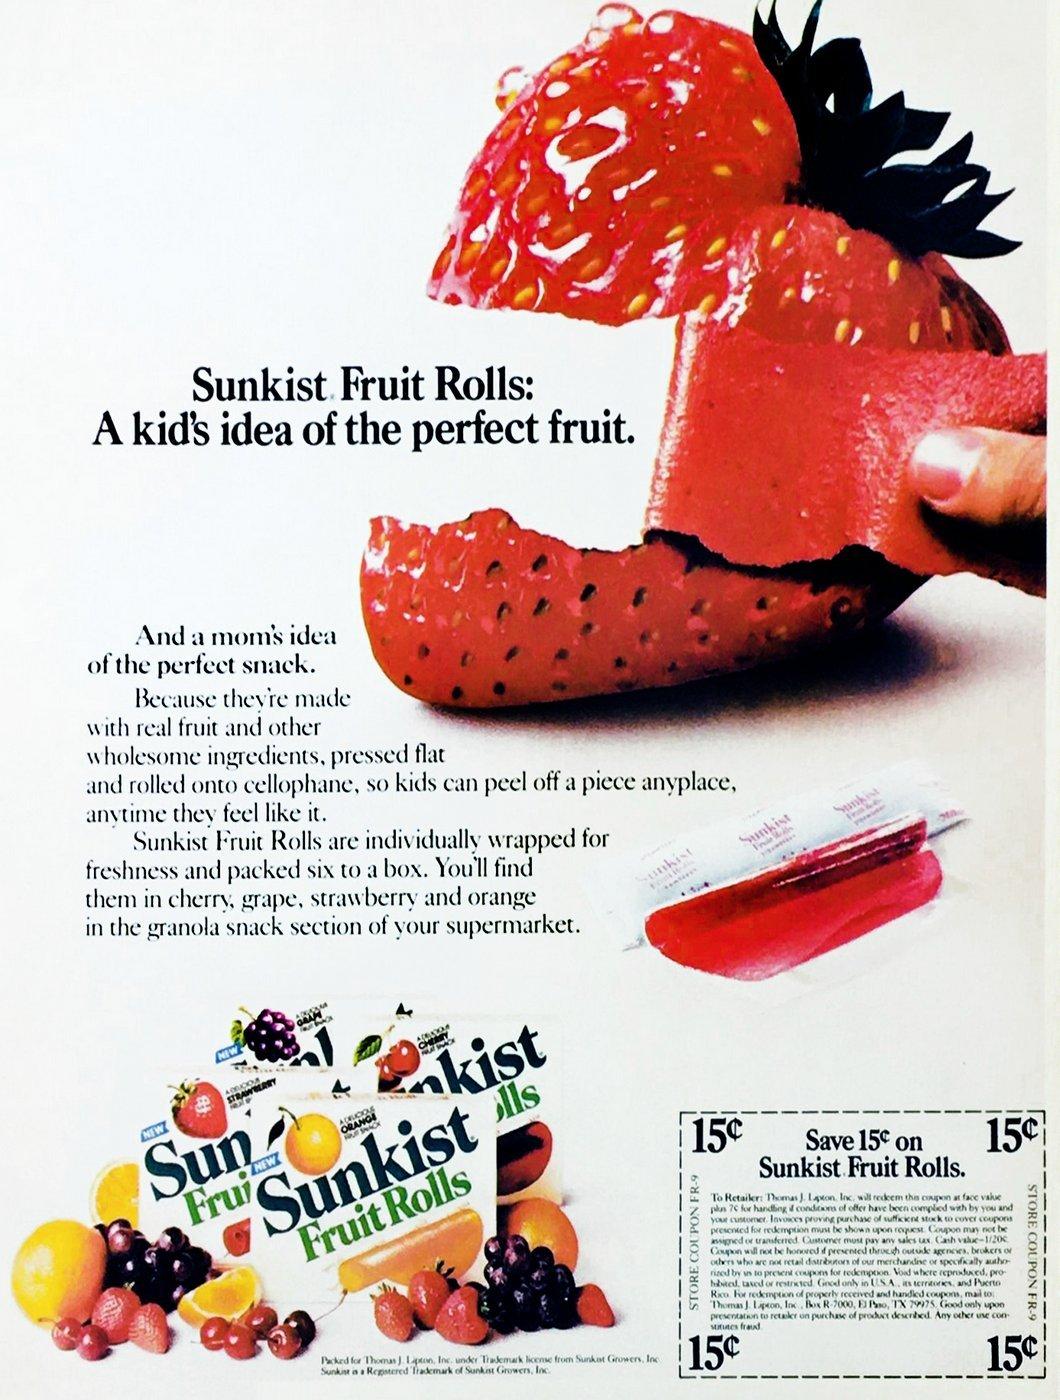 Vintage 1980s Sunkist Fruit Rolls (1984)